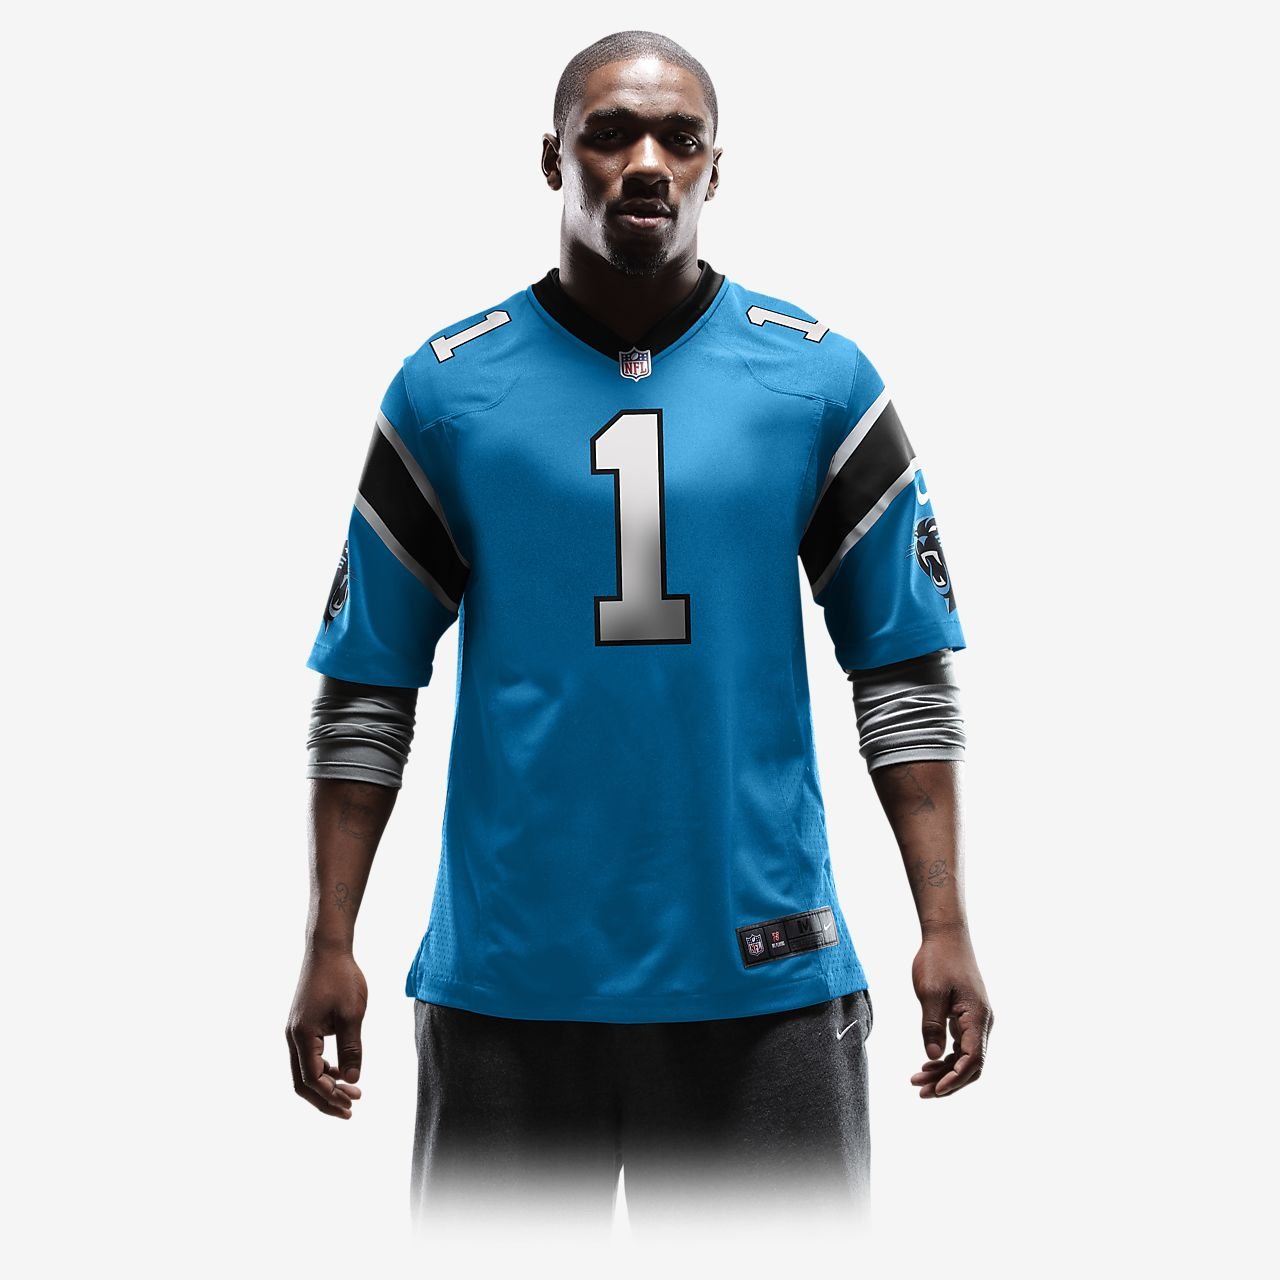 quality design bf64c 96e4d NFL Carolina Panthers (Cam Newton) Men's Game Football Jersey